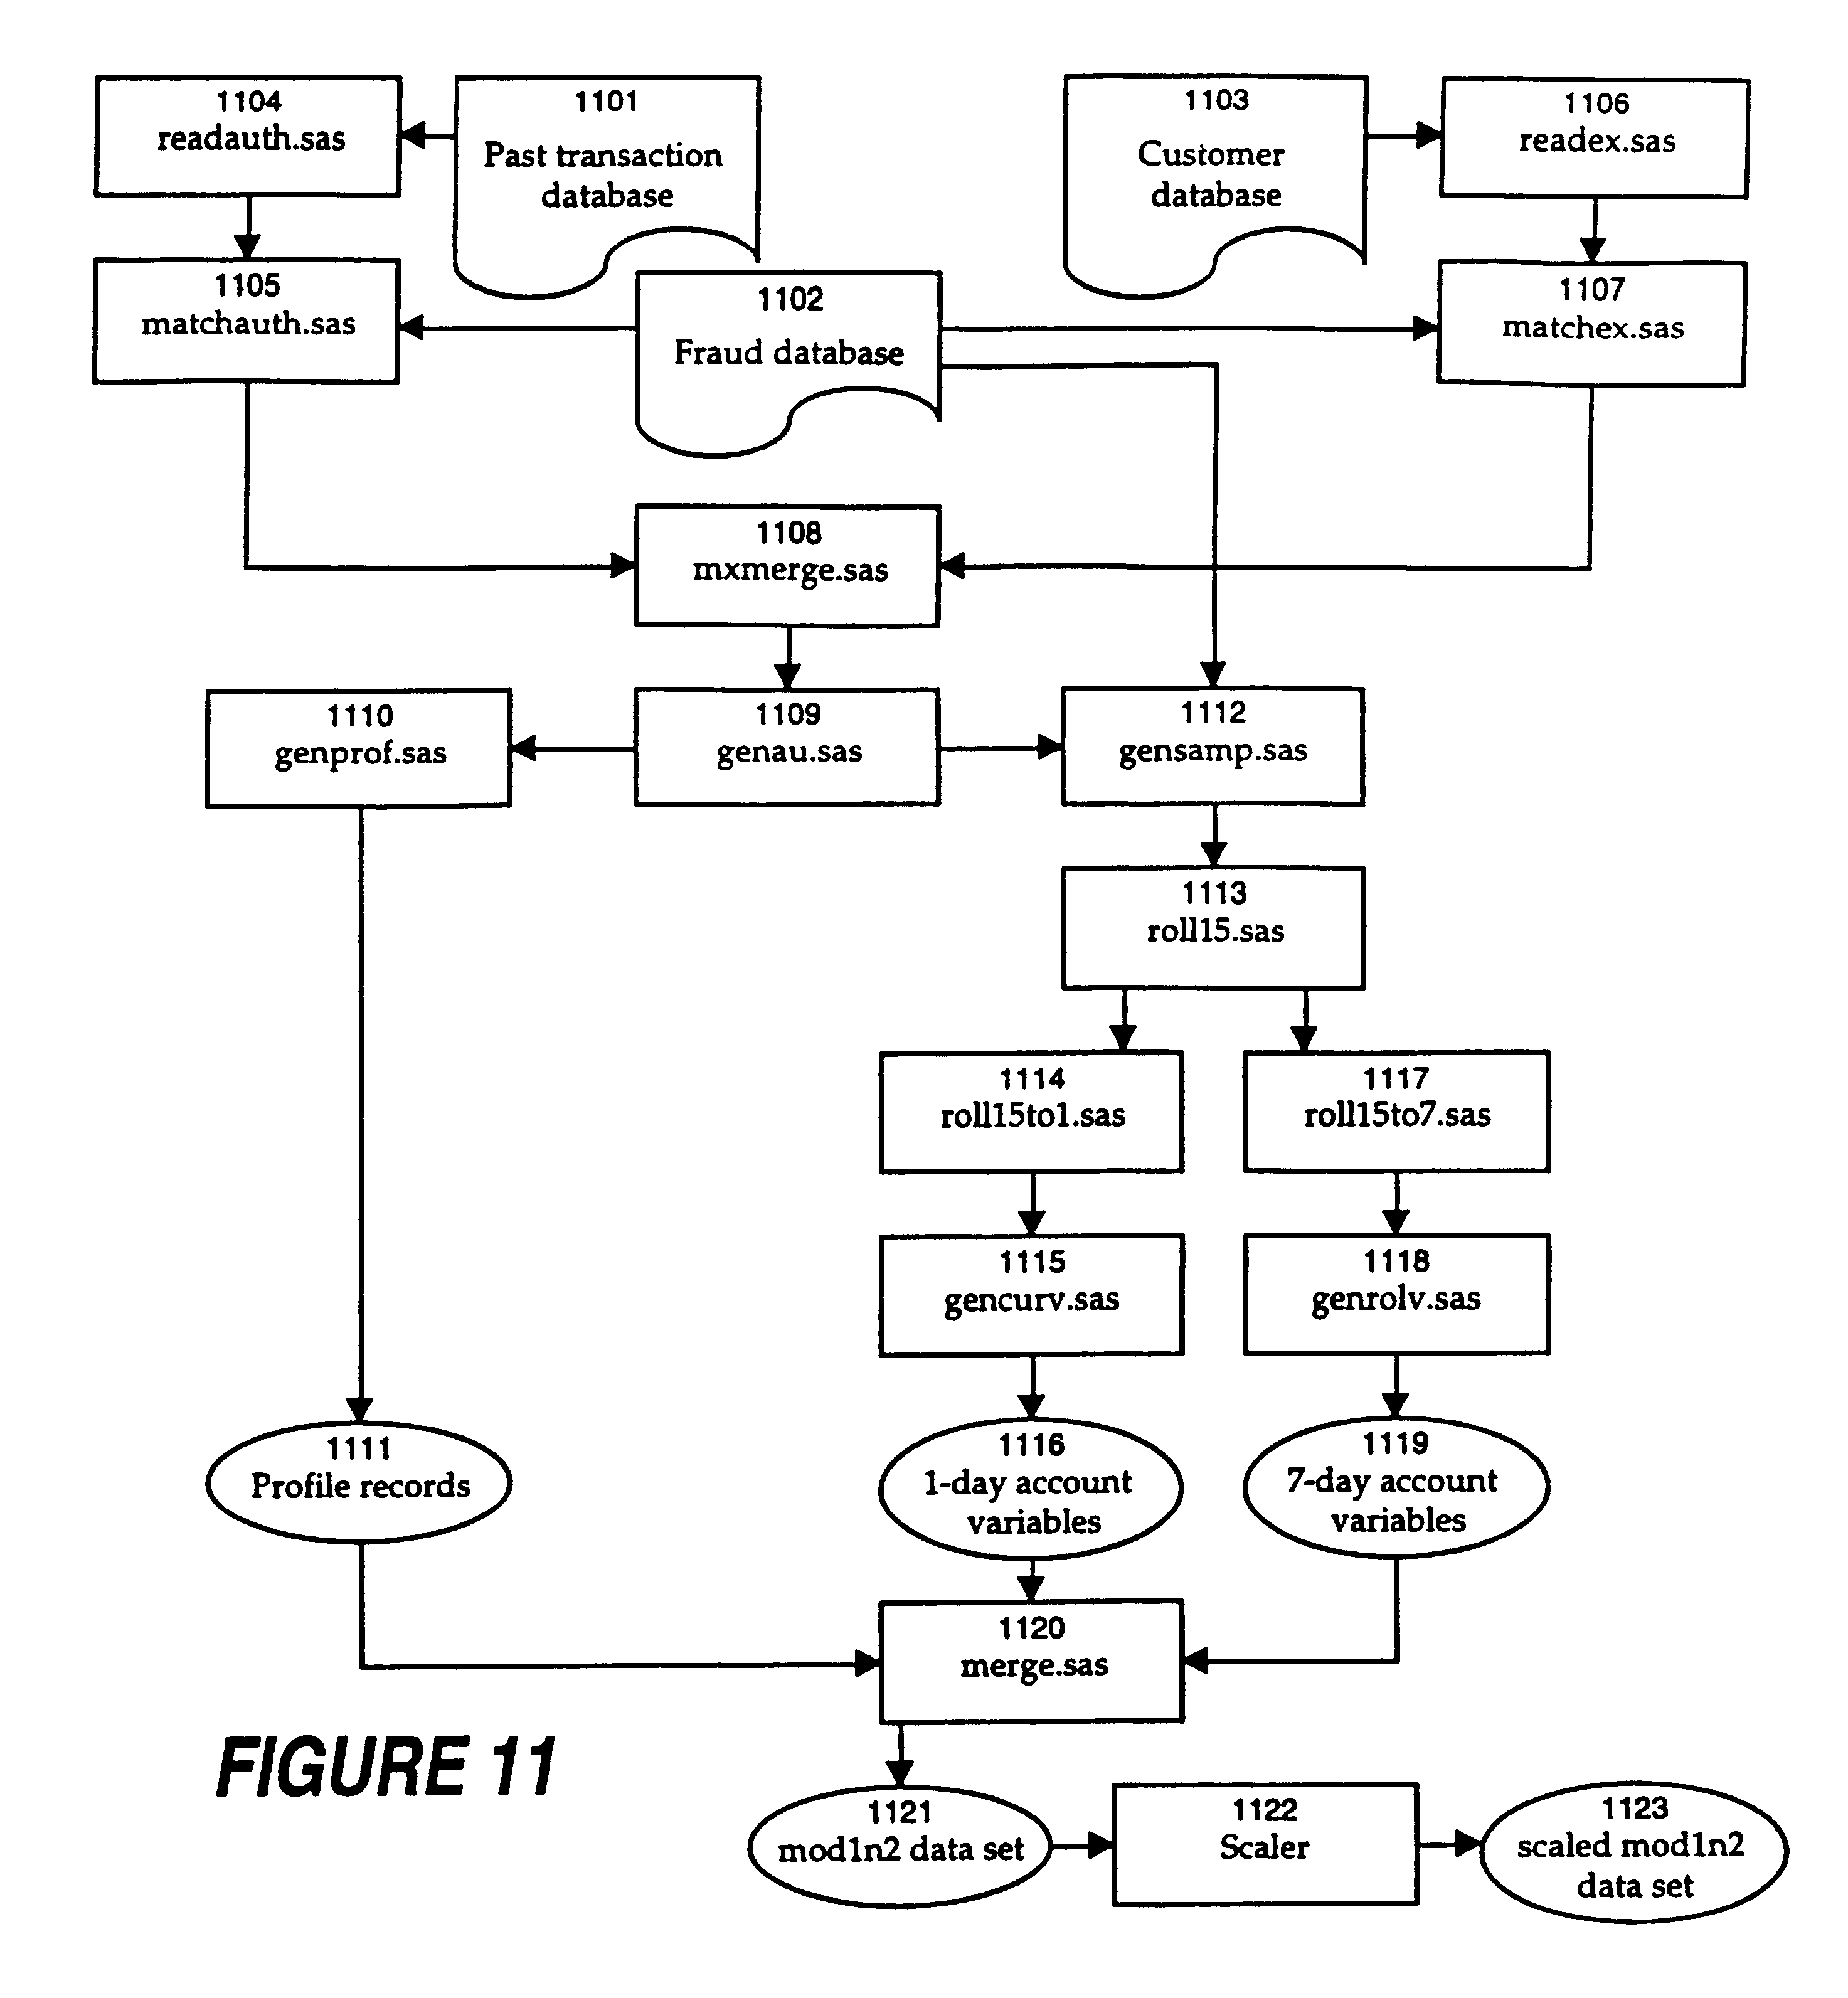 Patent US 6,330,546 B1